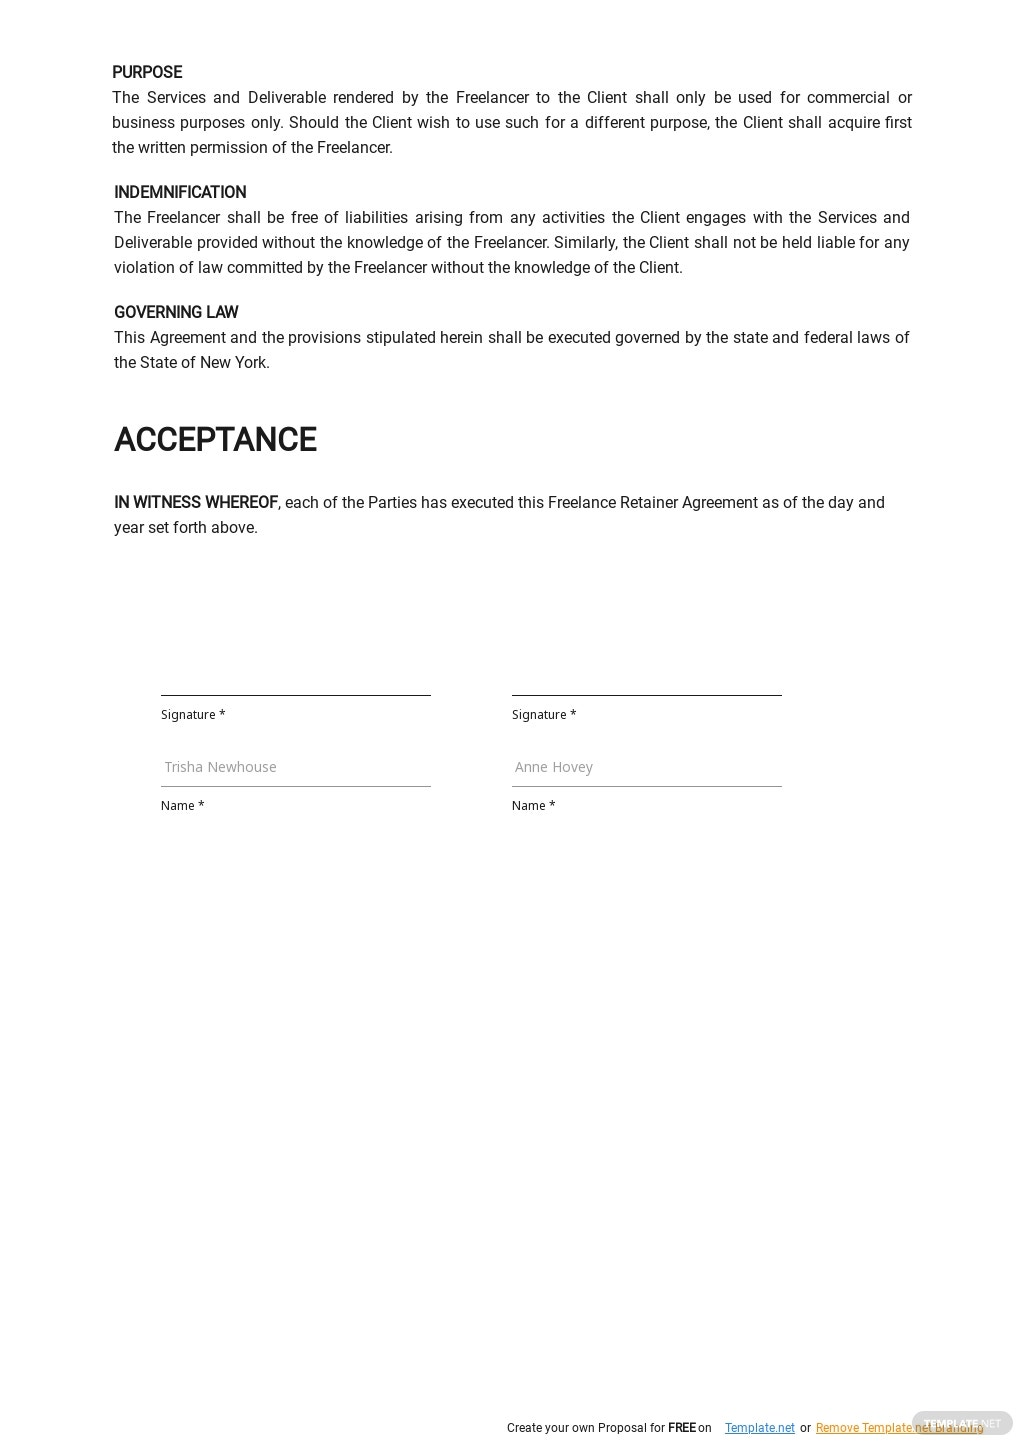 Freelance Retainer Agreement Template 2.jpe